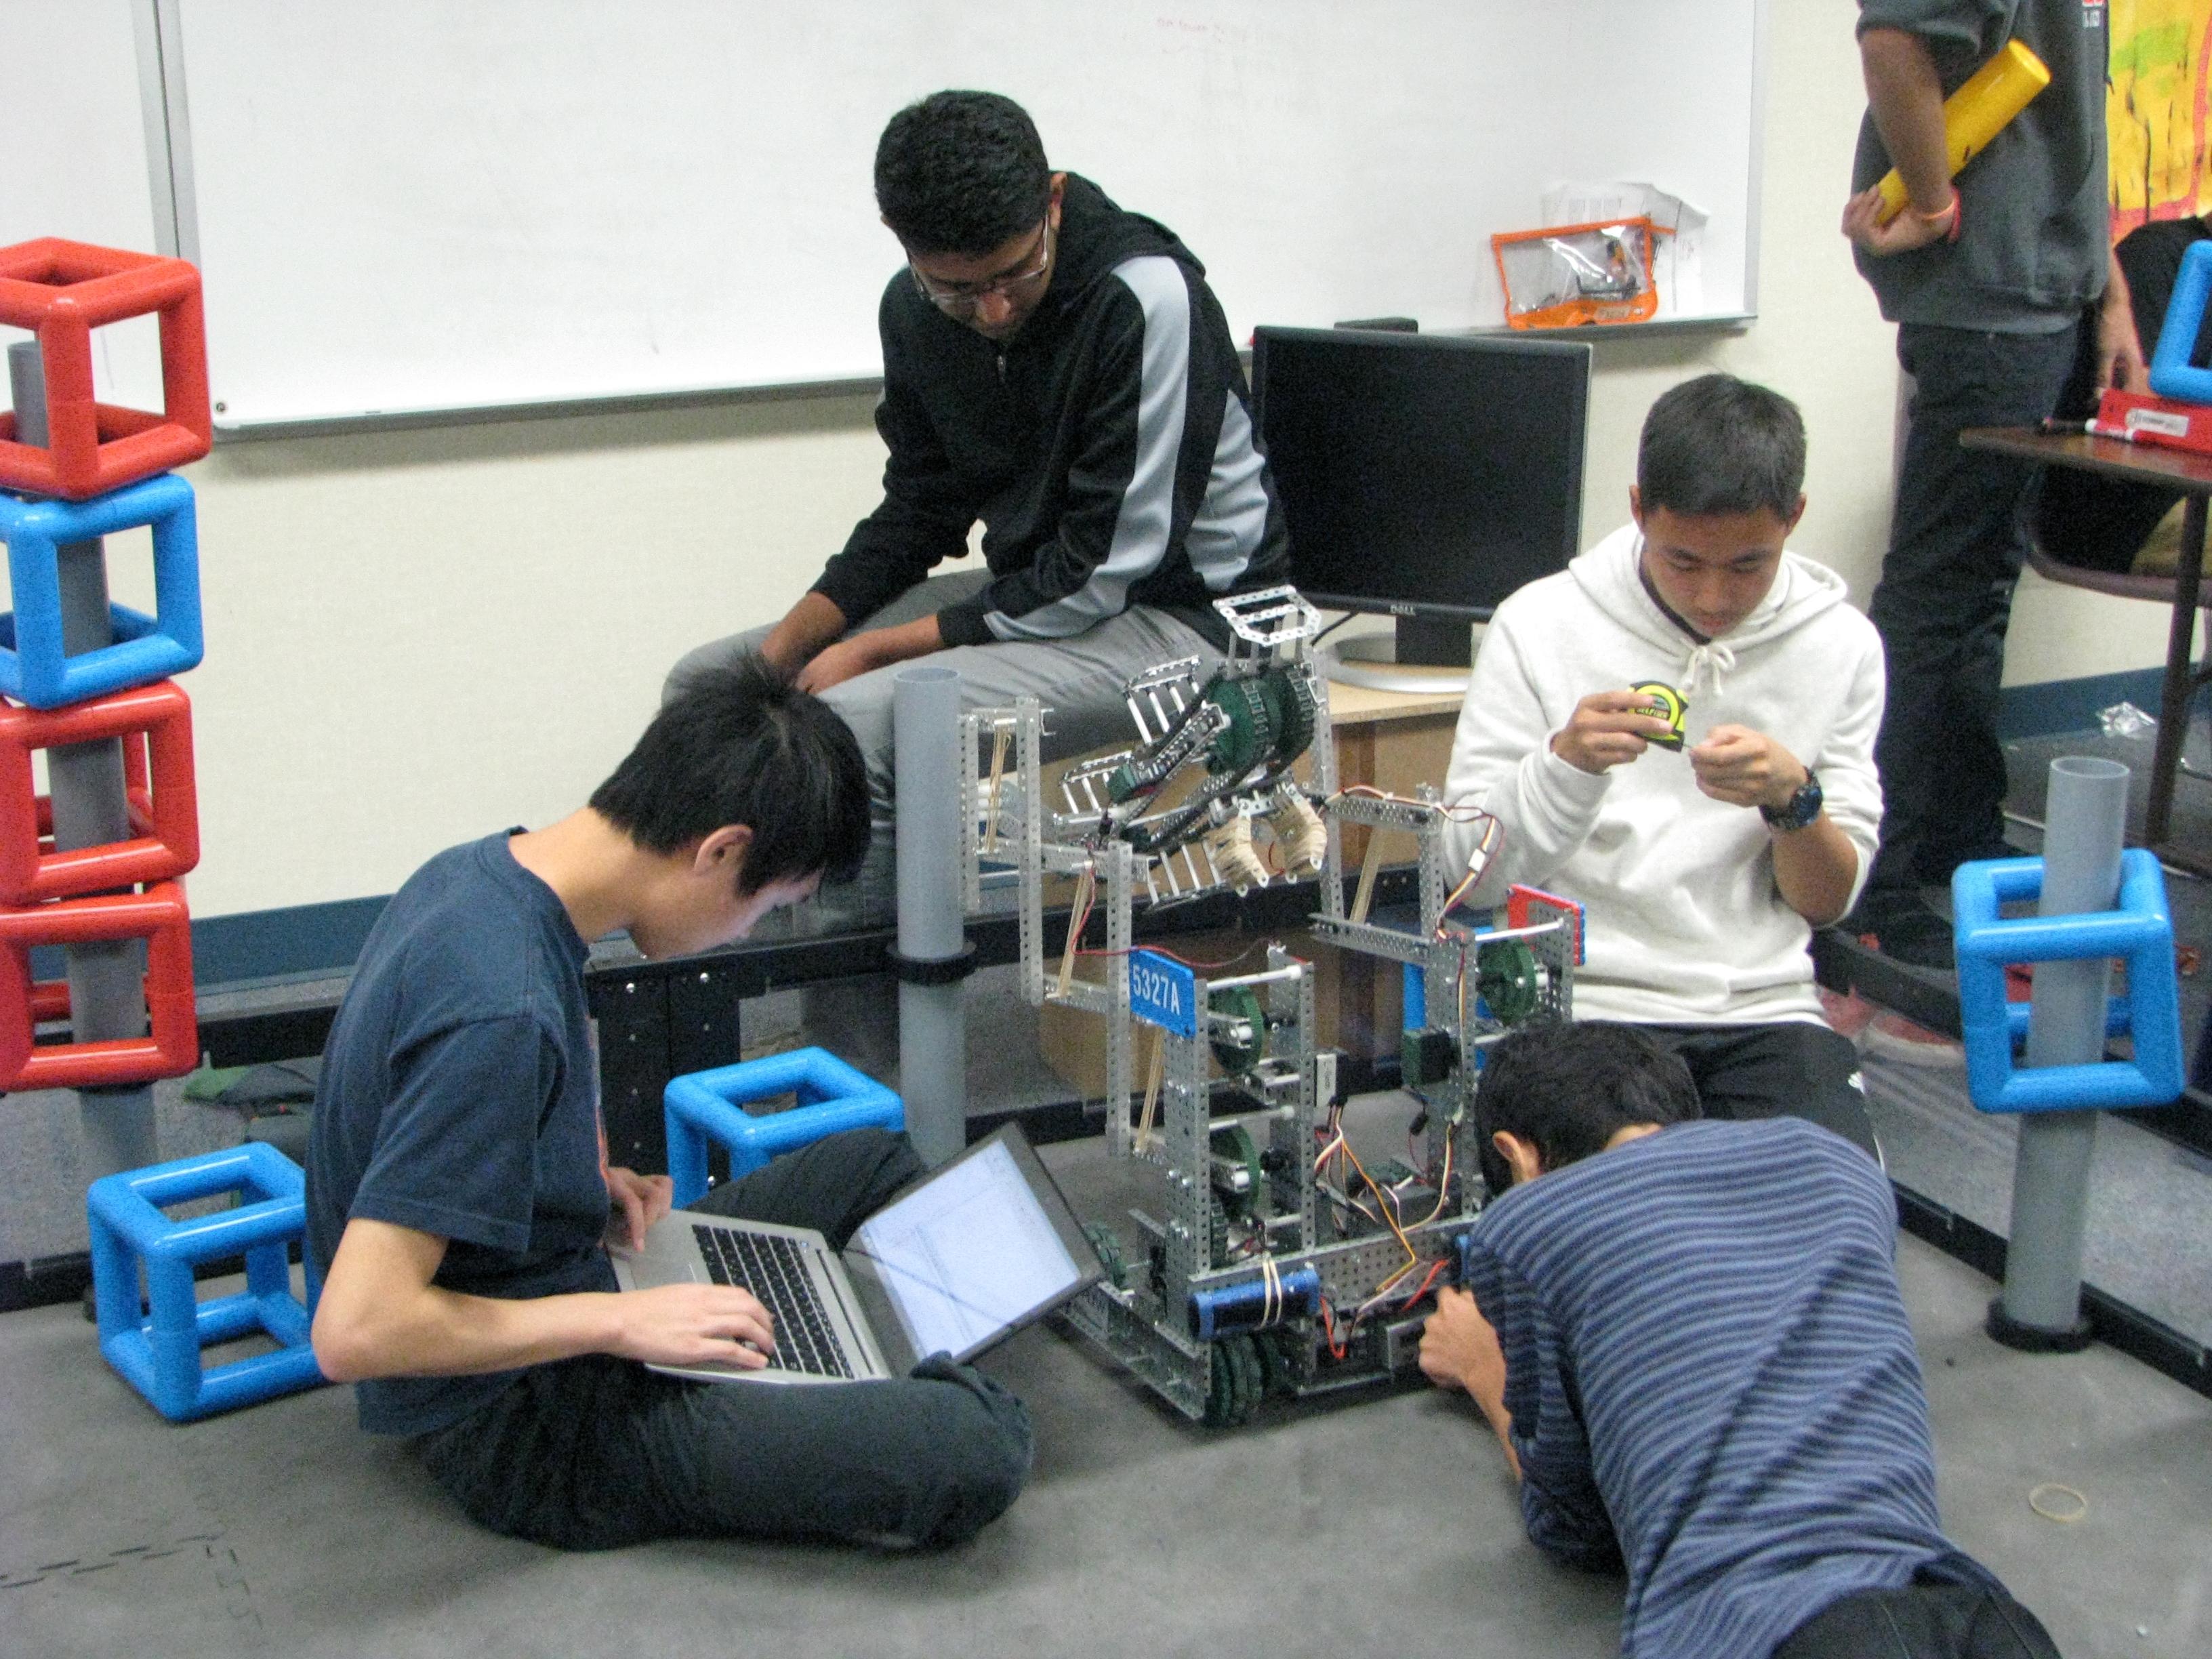 Dublin High School Robotics Club 5   OneDublin.org